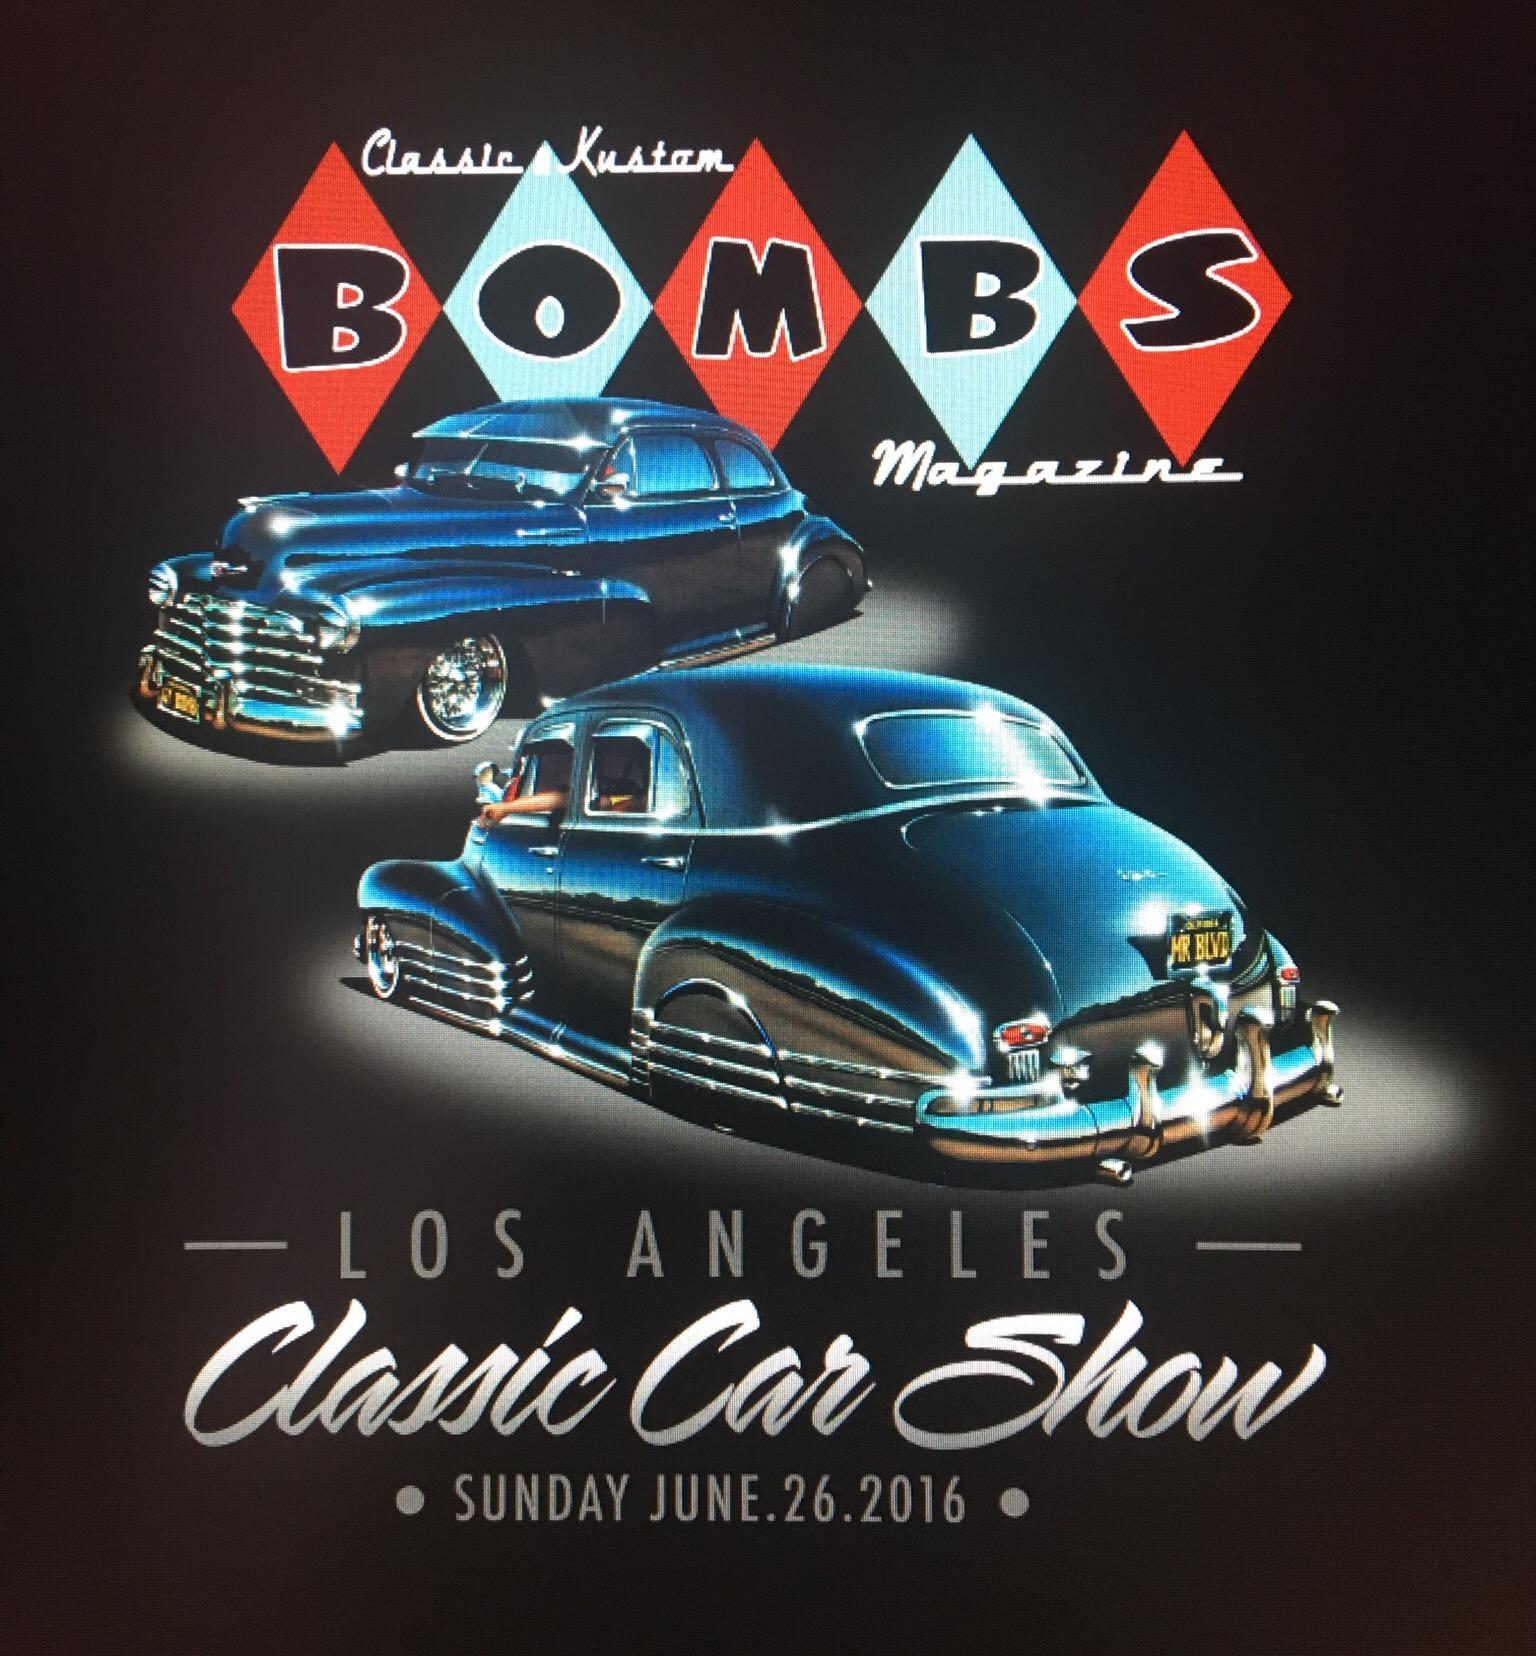 Los Angeles Classic Car Show June EVENT HIGHLIGHTS - Classic car show los angeles